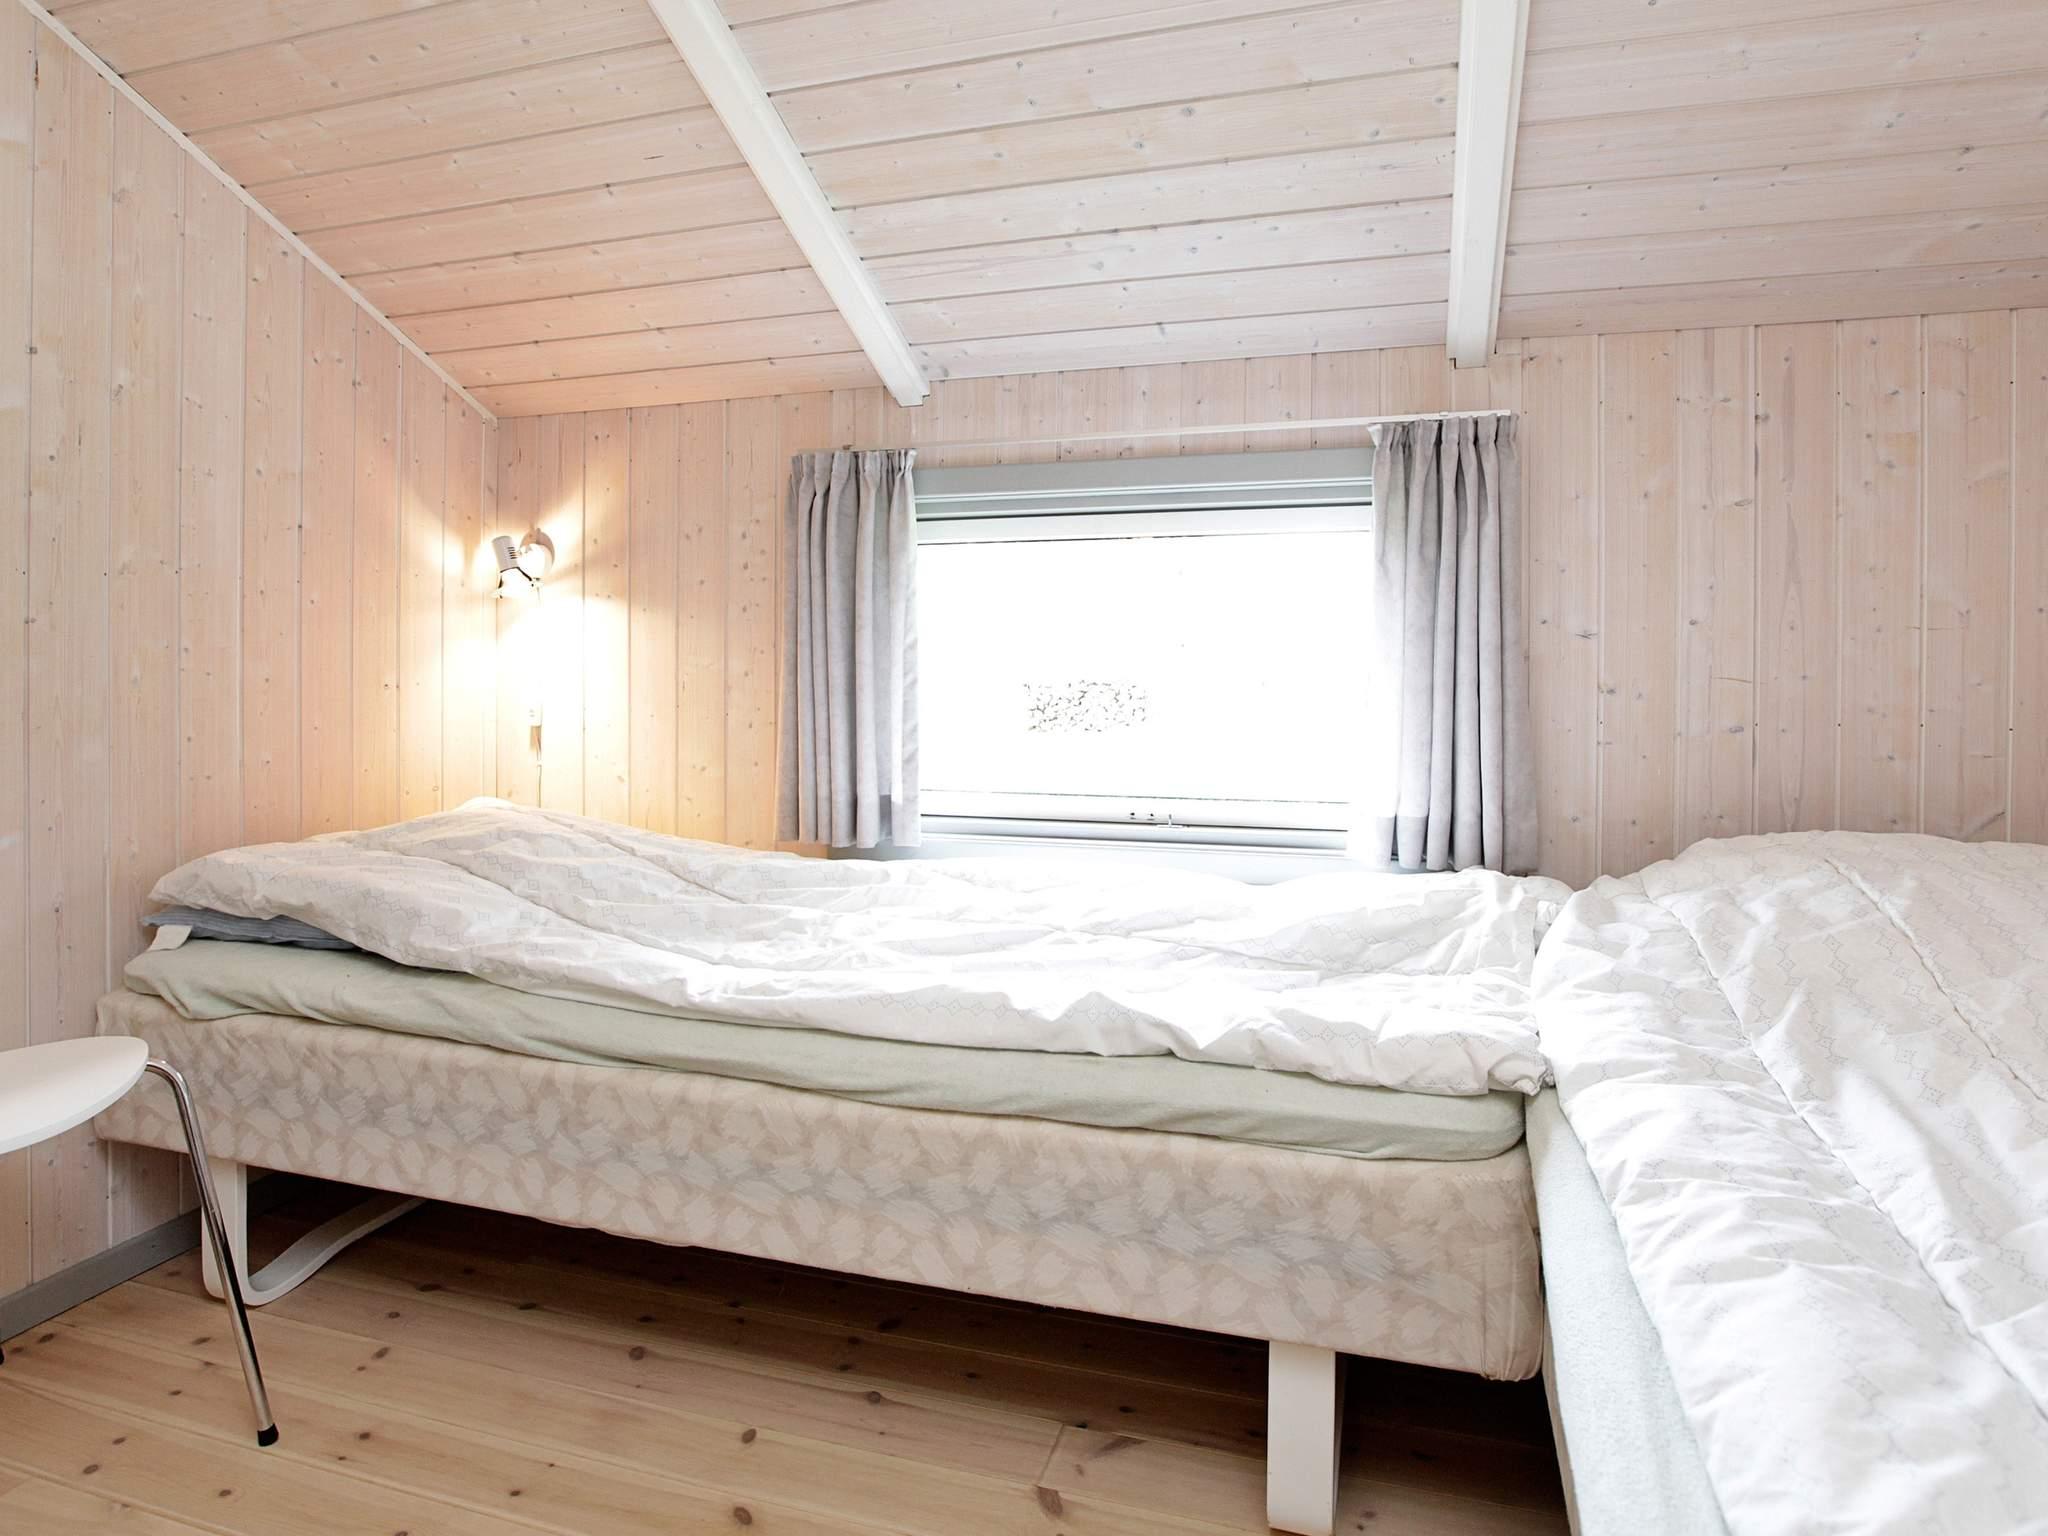 Ferienhaus Bogø (319934), Bogø By, , Seelandinseln, Dänemark, Bild 11